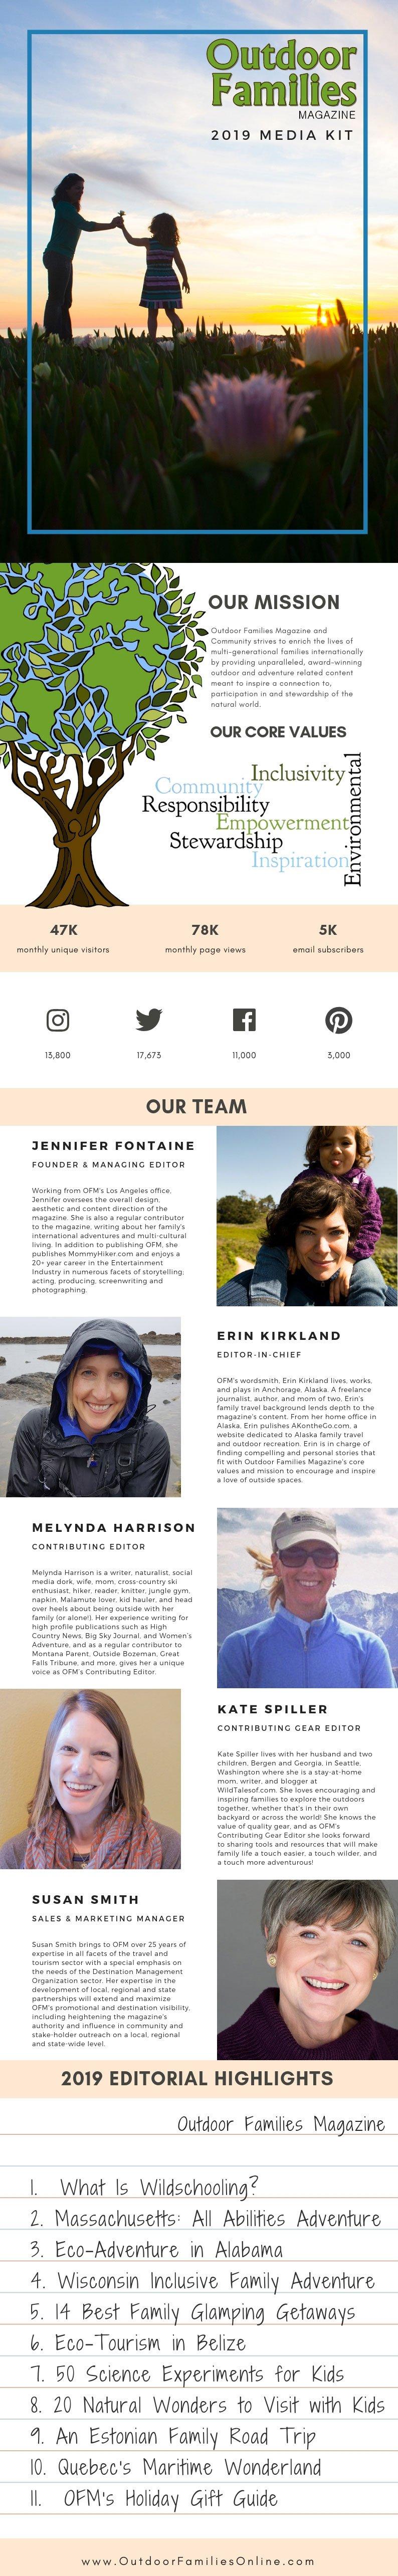 outdoor families magazine 2019 media kit